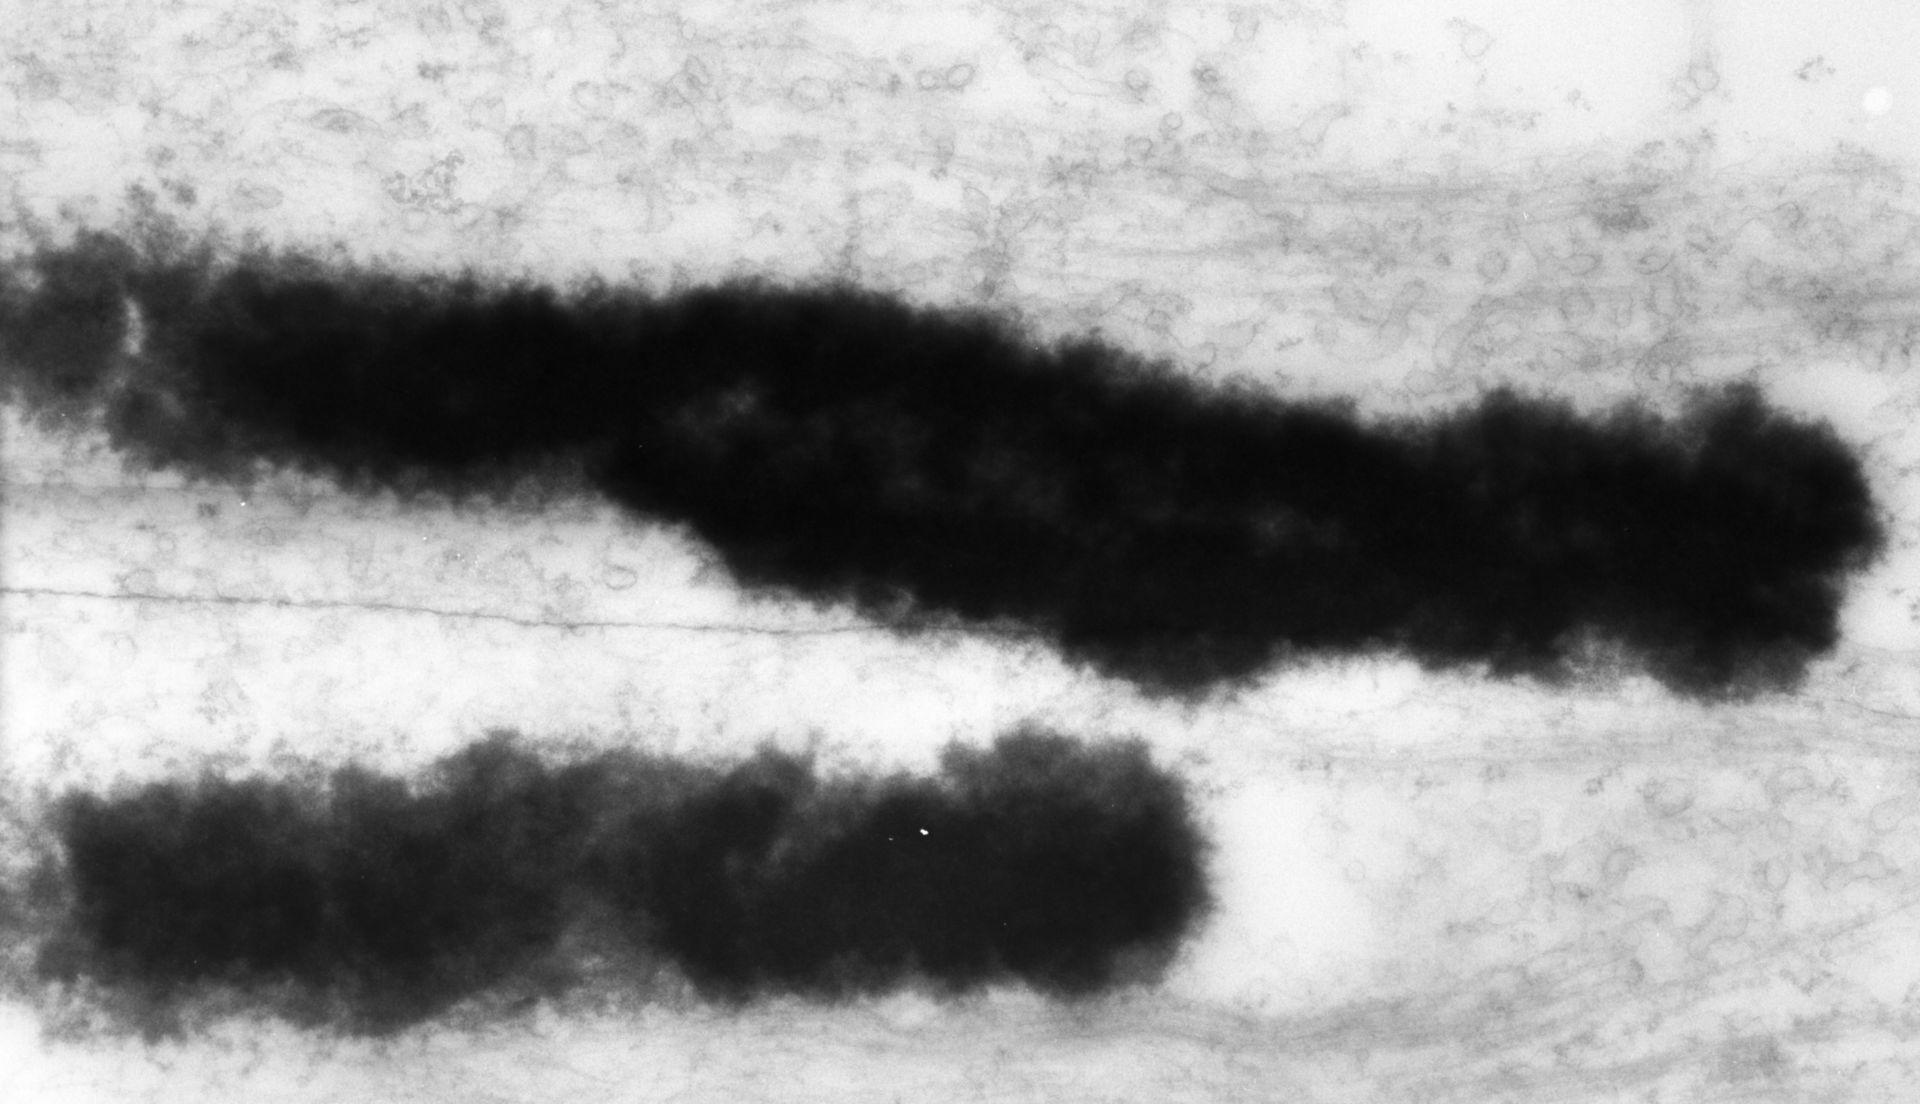 Haemanthus katharinae (Nuclear chromosome) - CIL:11915